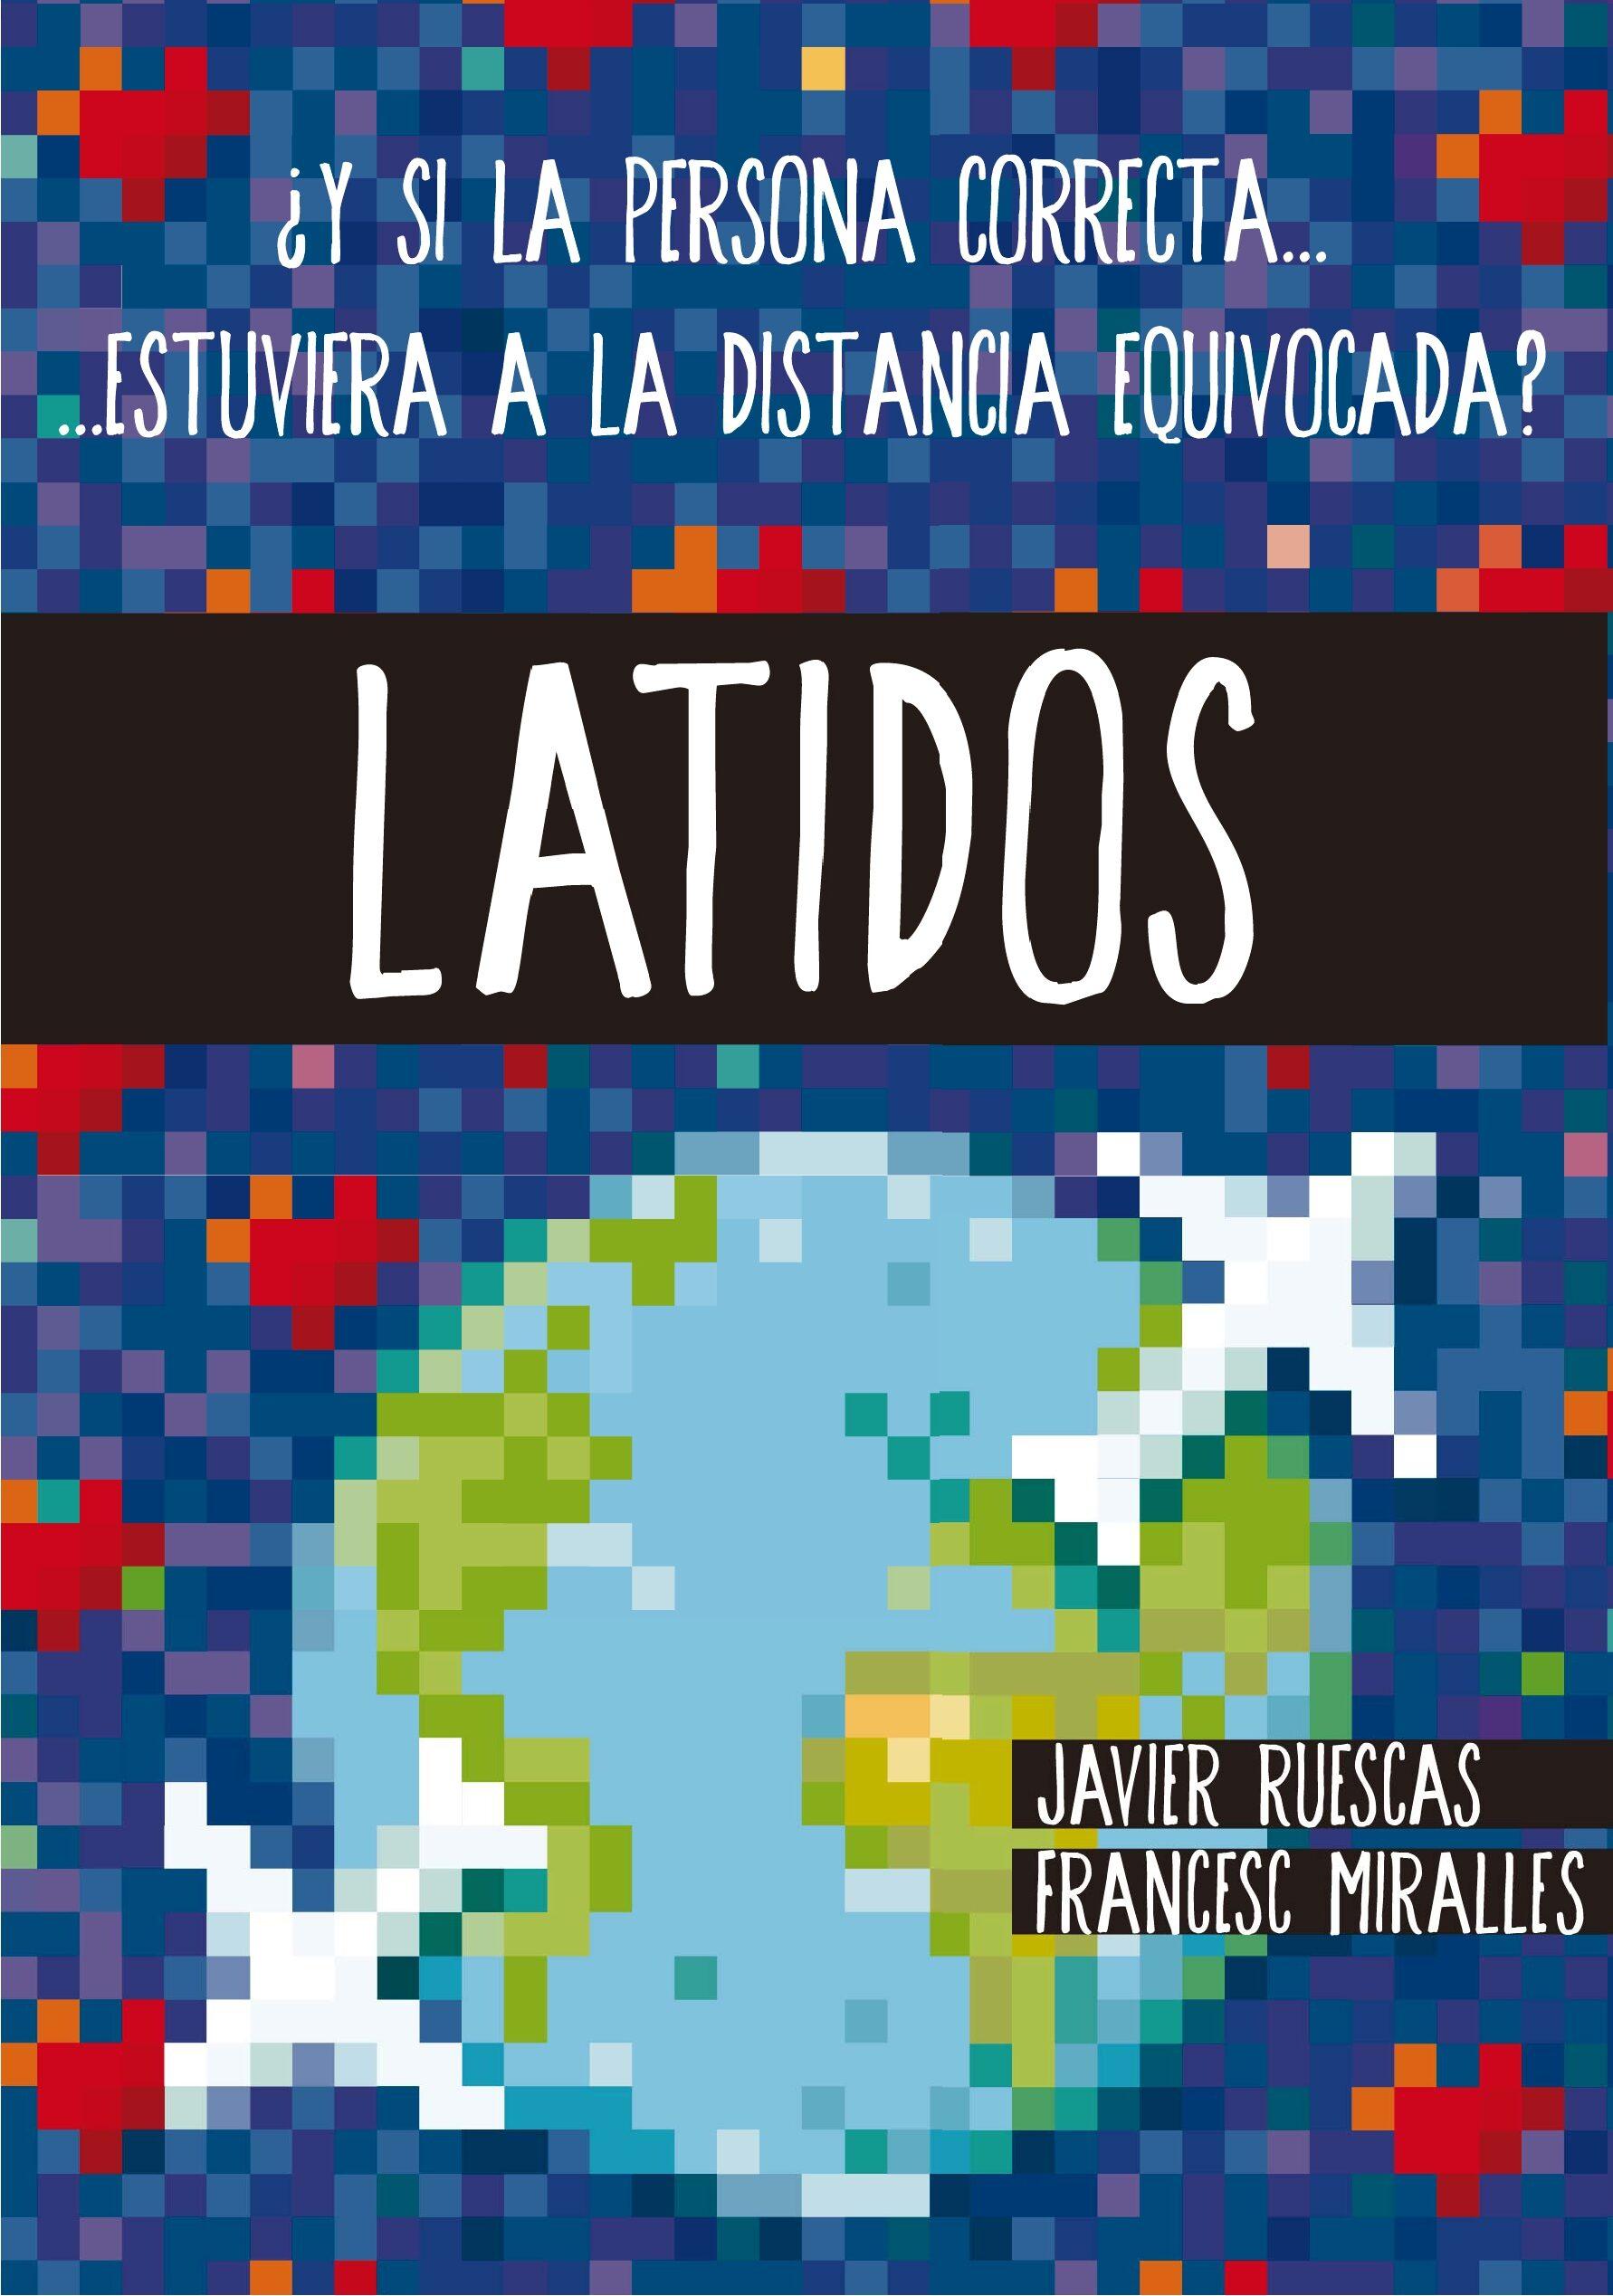 latidos-francesc miralles-javier ruescas-9788467585889